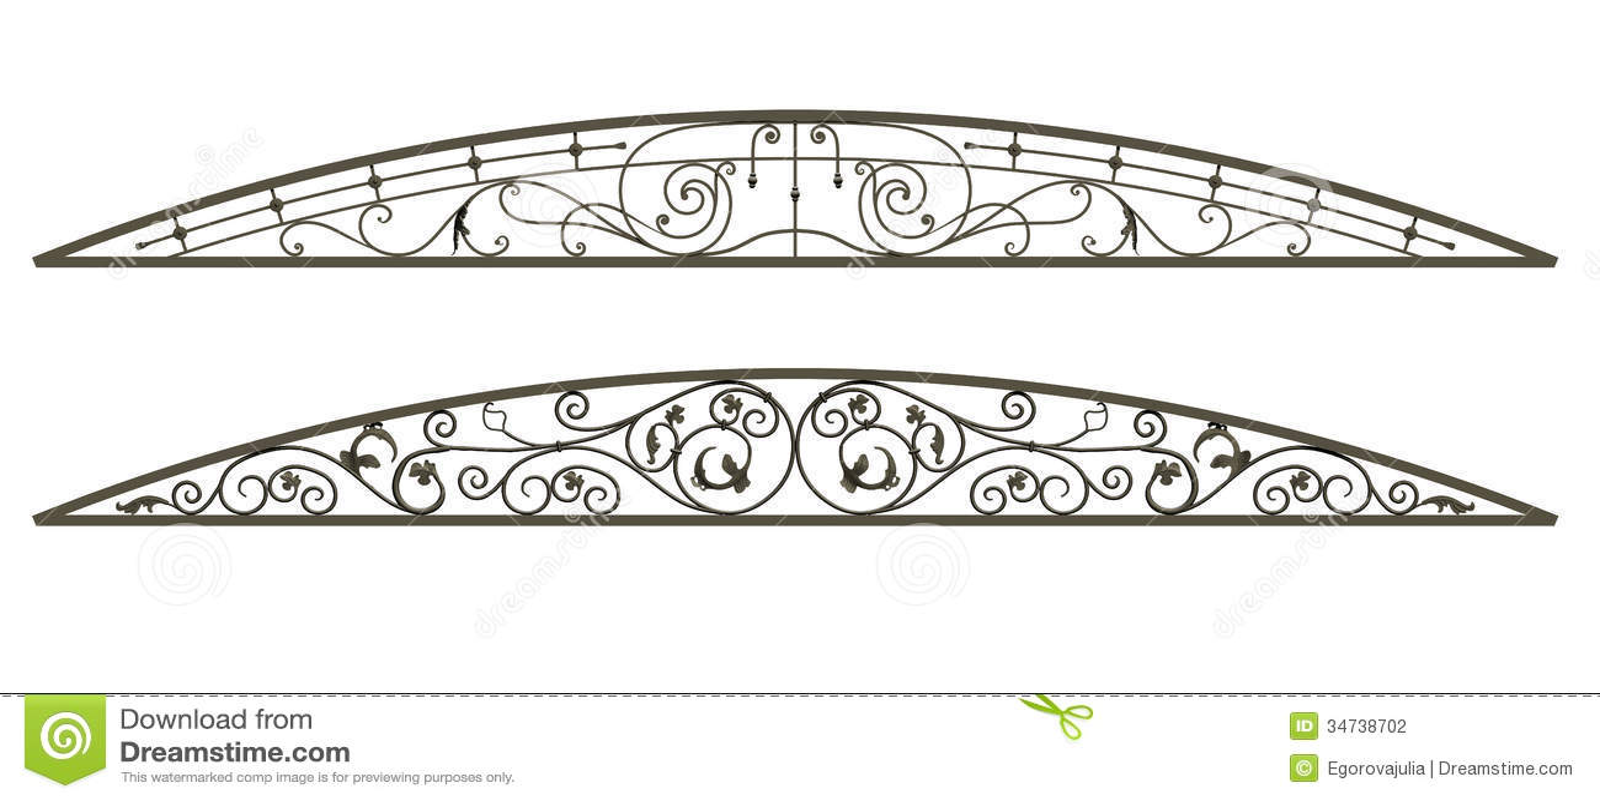 Royalty-Free Stock Photo  sc 1 st  Dreamstime.com & Wrought iron canopy stock illustration. Illustration of design ...